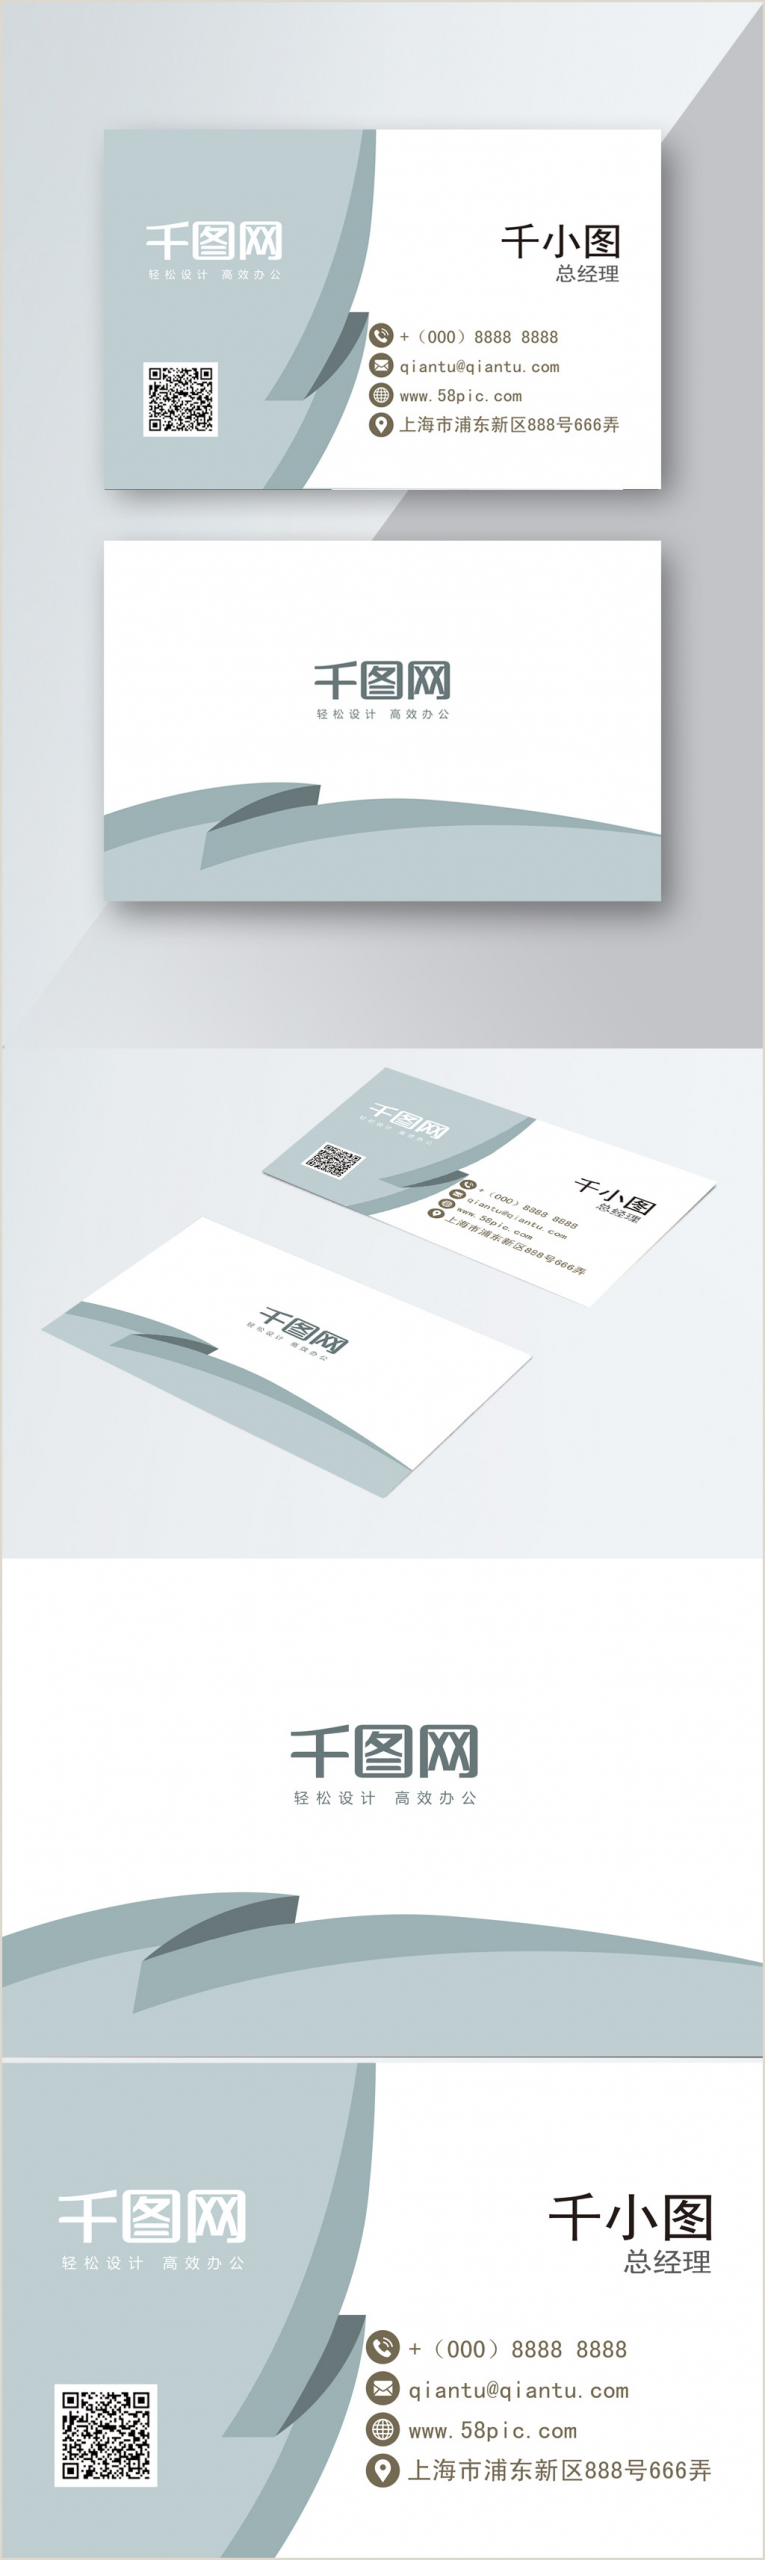 Unique Relief Business Cards Unique Business Card Template Image Picture Free